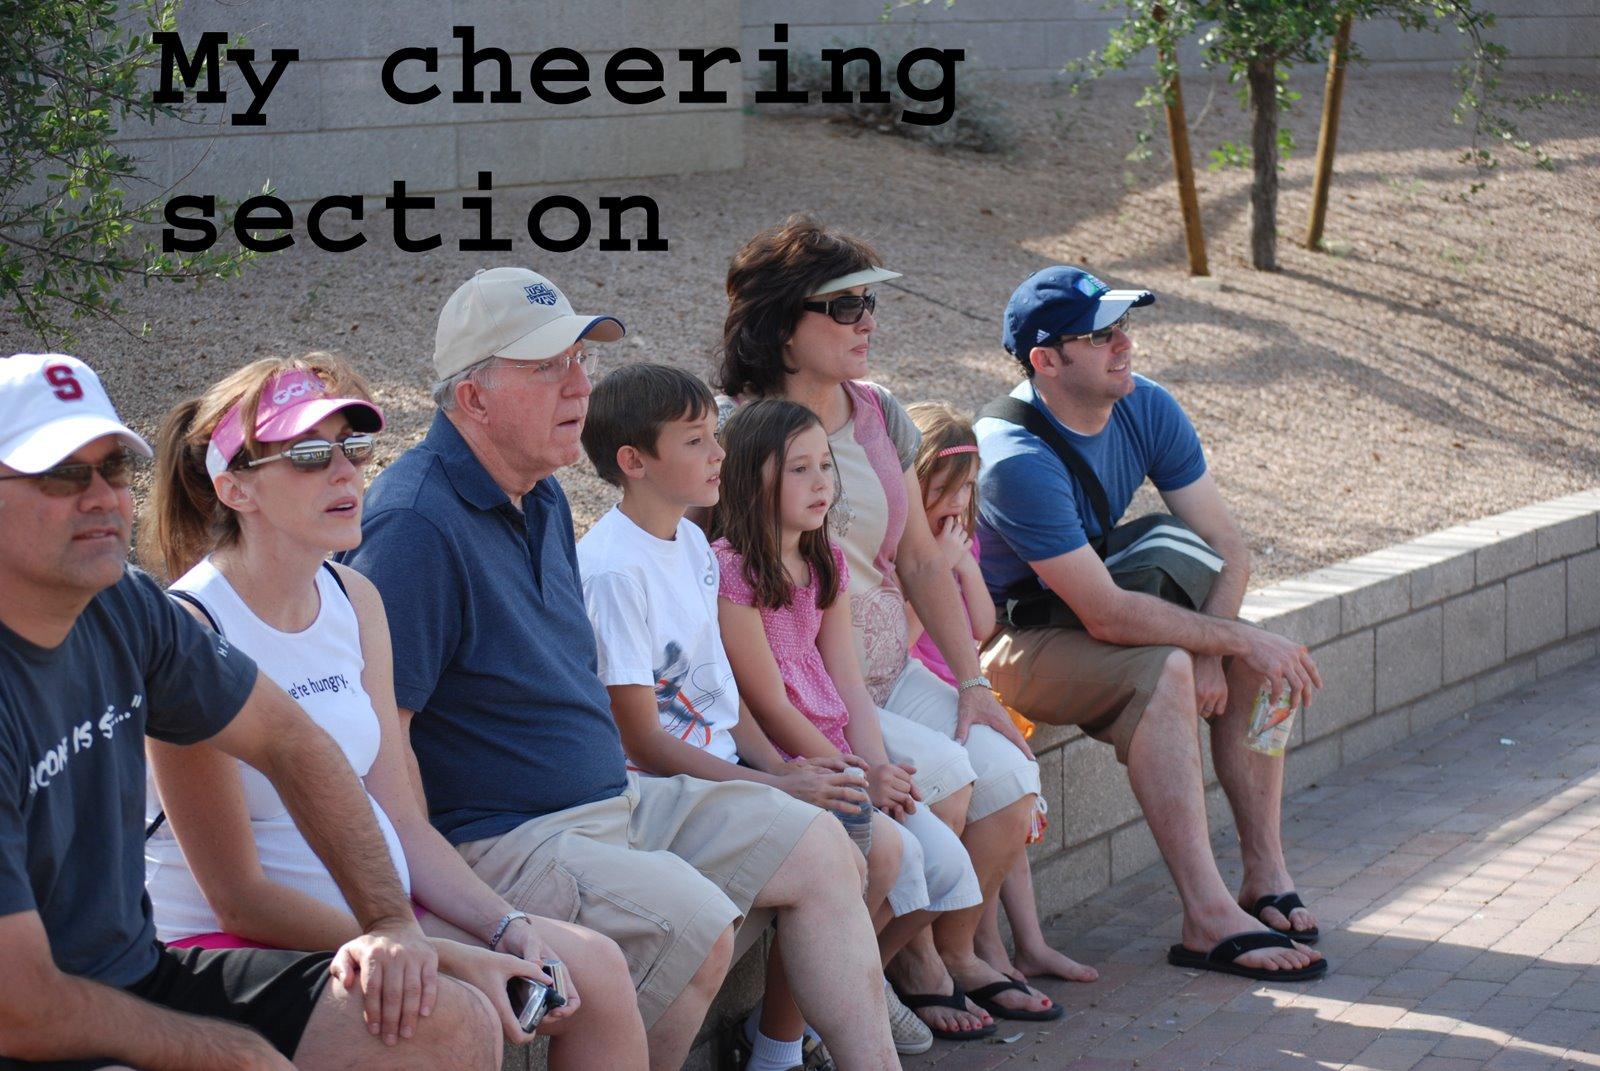 [cheering+section.jpg]